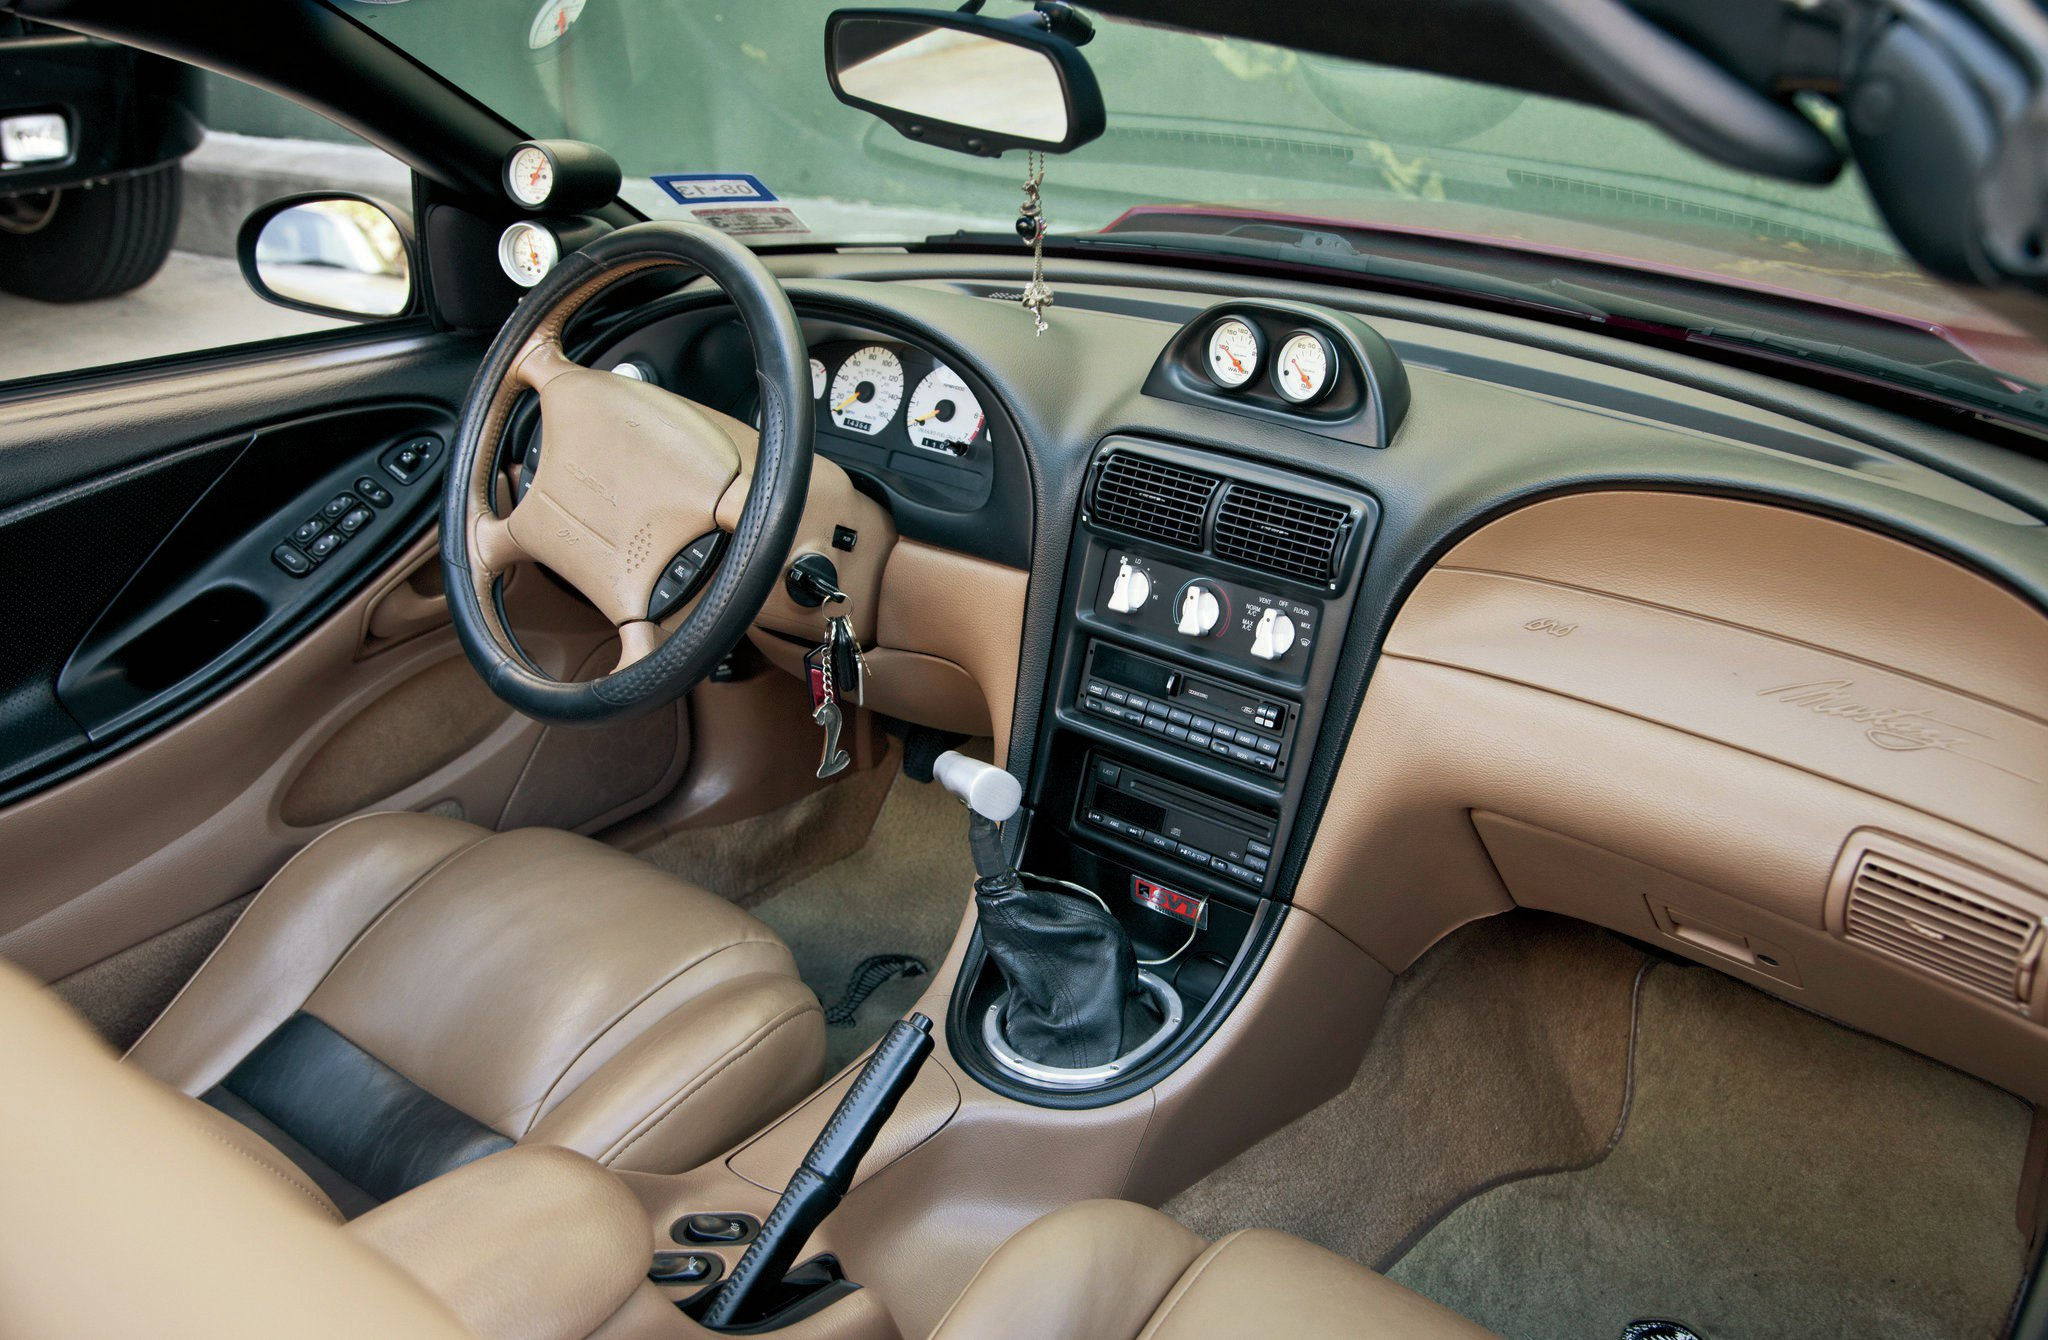 1994 Ford Mustang Interior 1